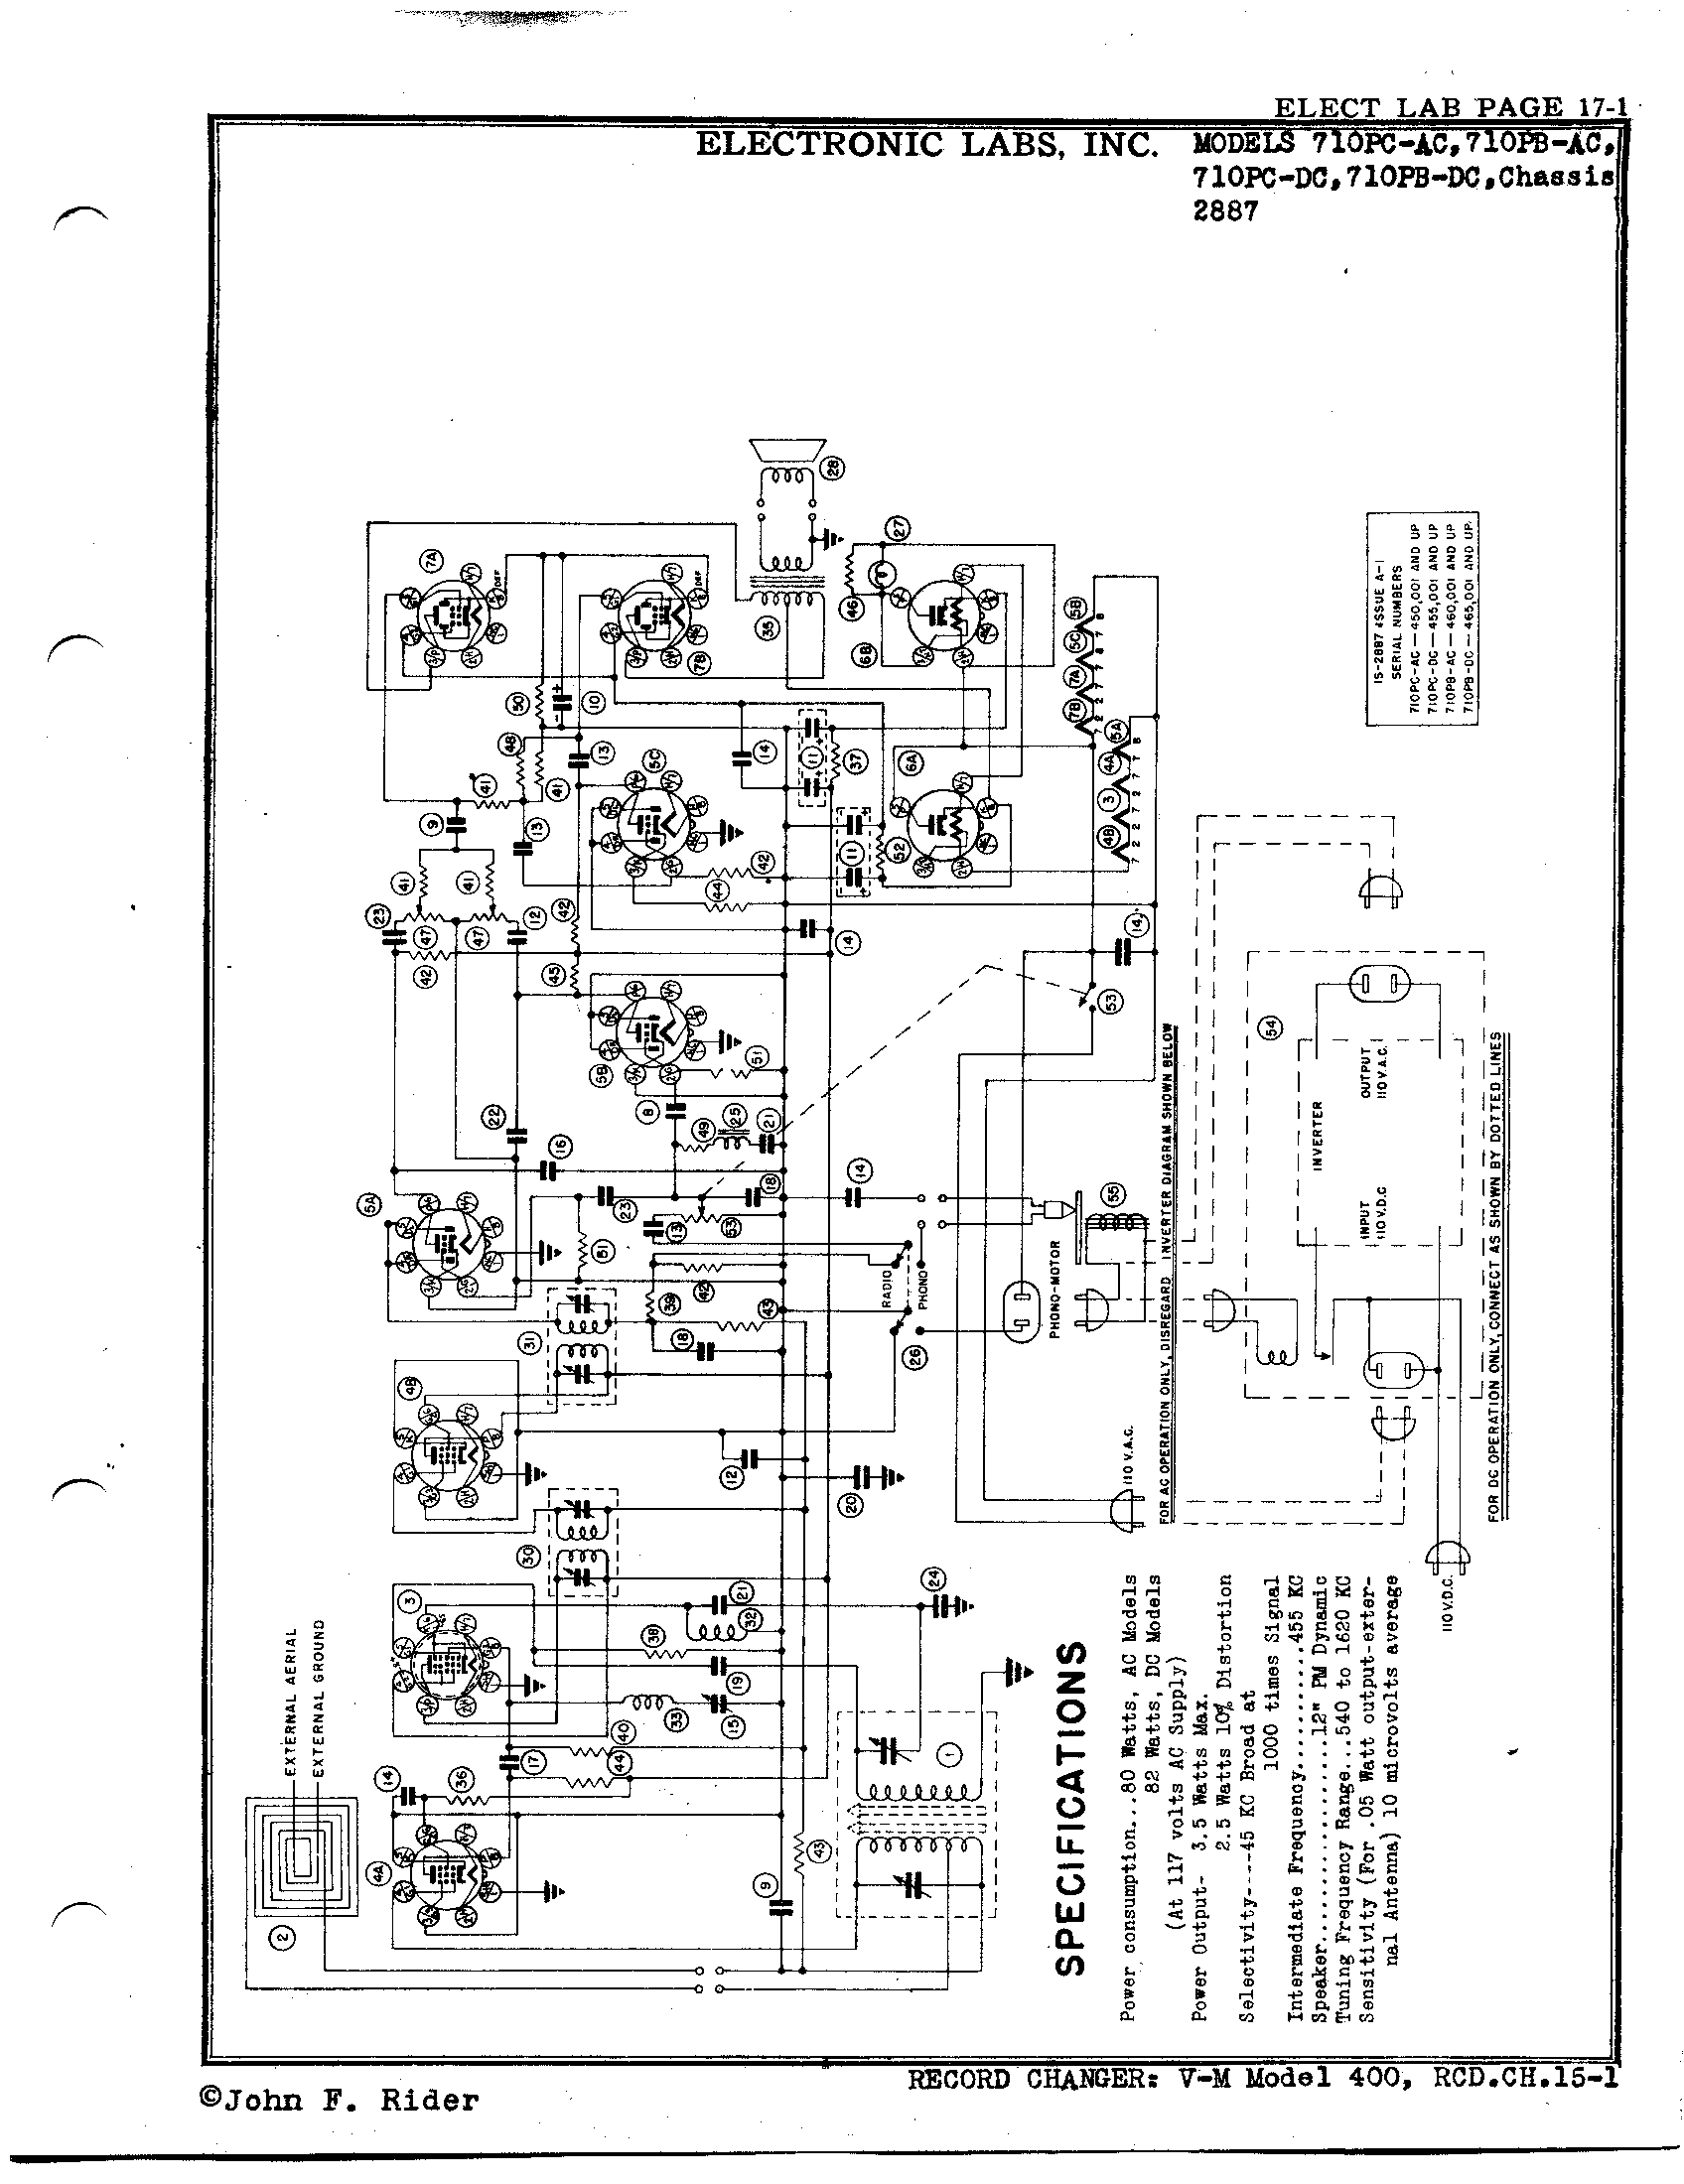 Electronic Laboratories, Inc  710PB-DC | Antique Electronic Supply